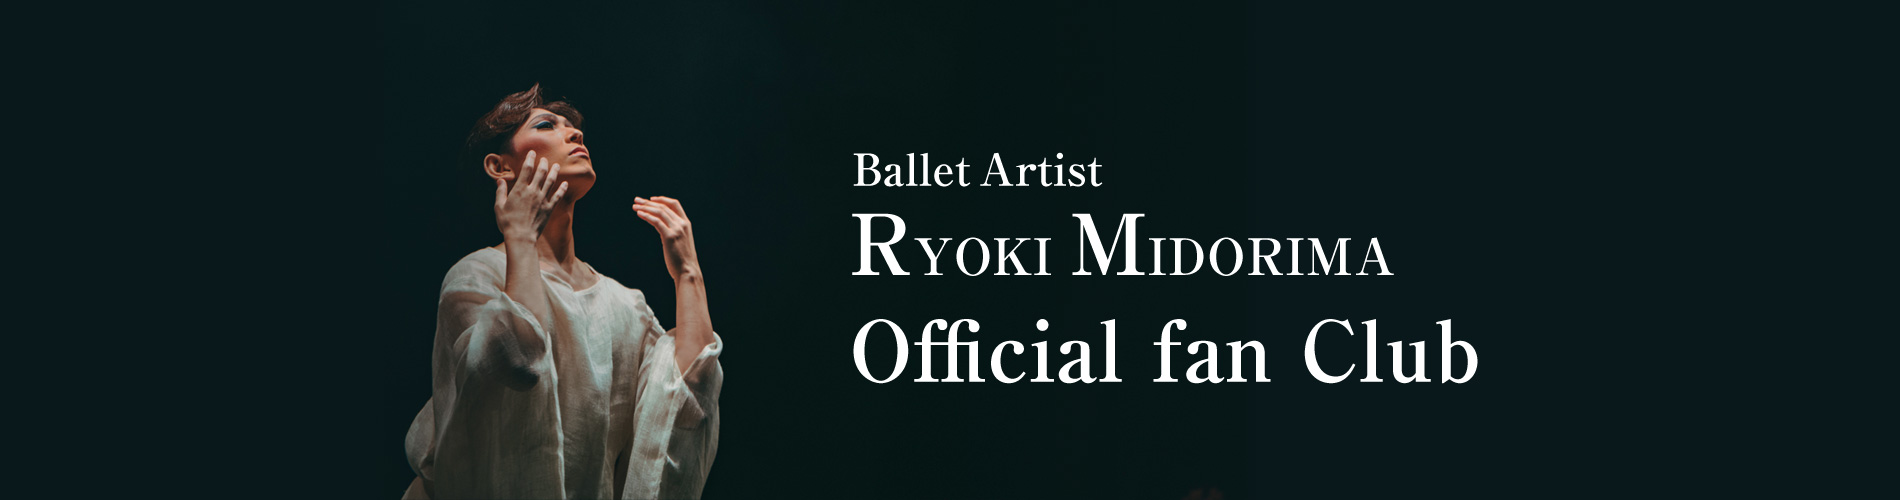 Ballet Artist RYOKI MIDORIMA Official fan Club